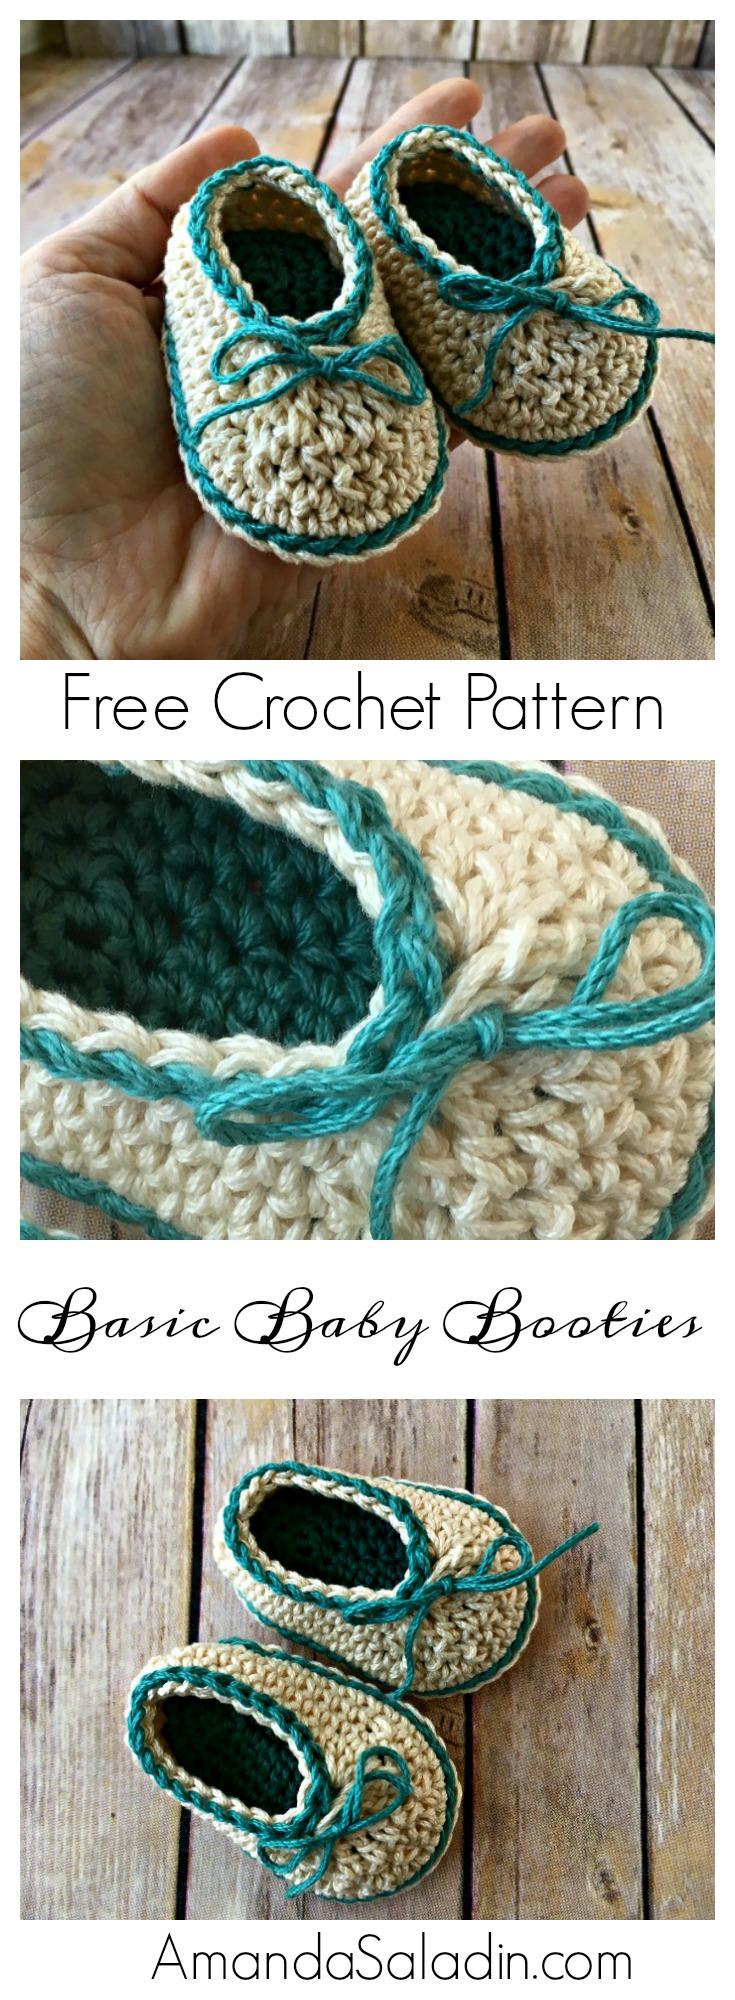 Basic Baby Booties - Free Crochet Pattern - Amanda Saladin